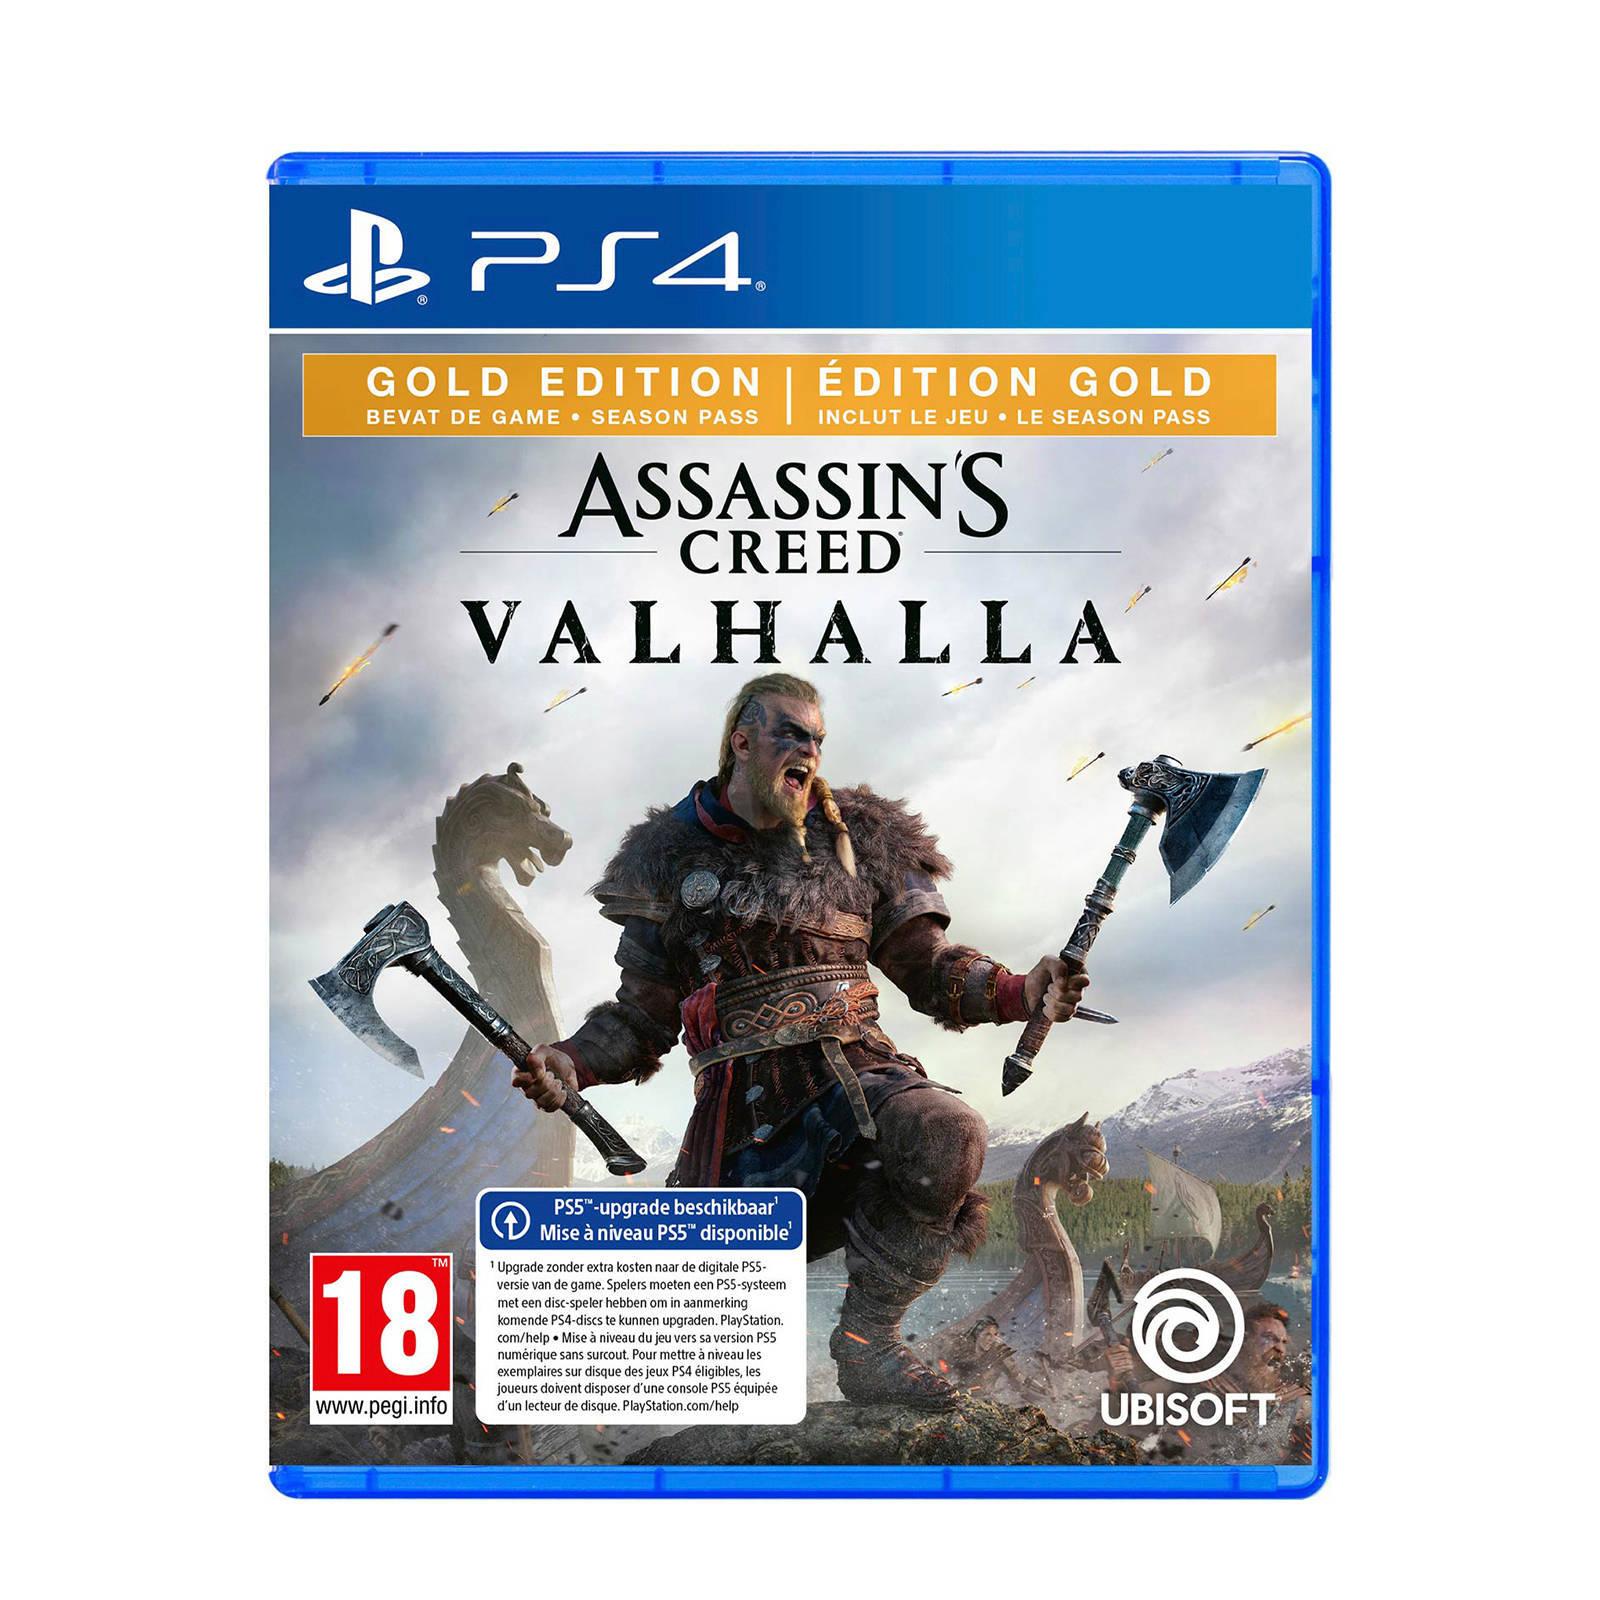 Assassin's Creed: Valhalla - Gold Edition (PS4/XB1) @ Wehkamp